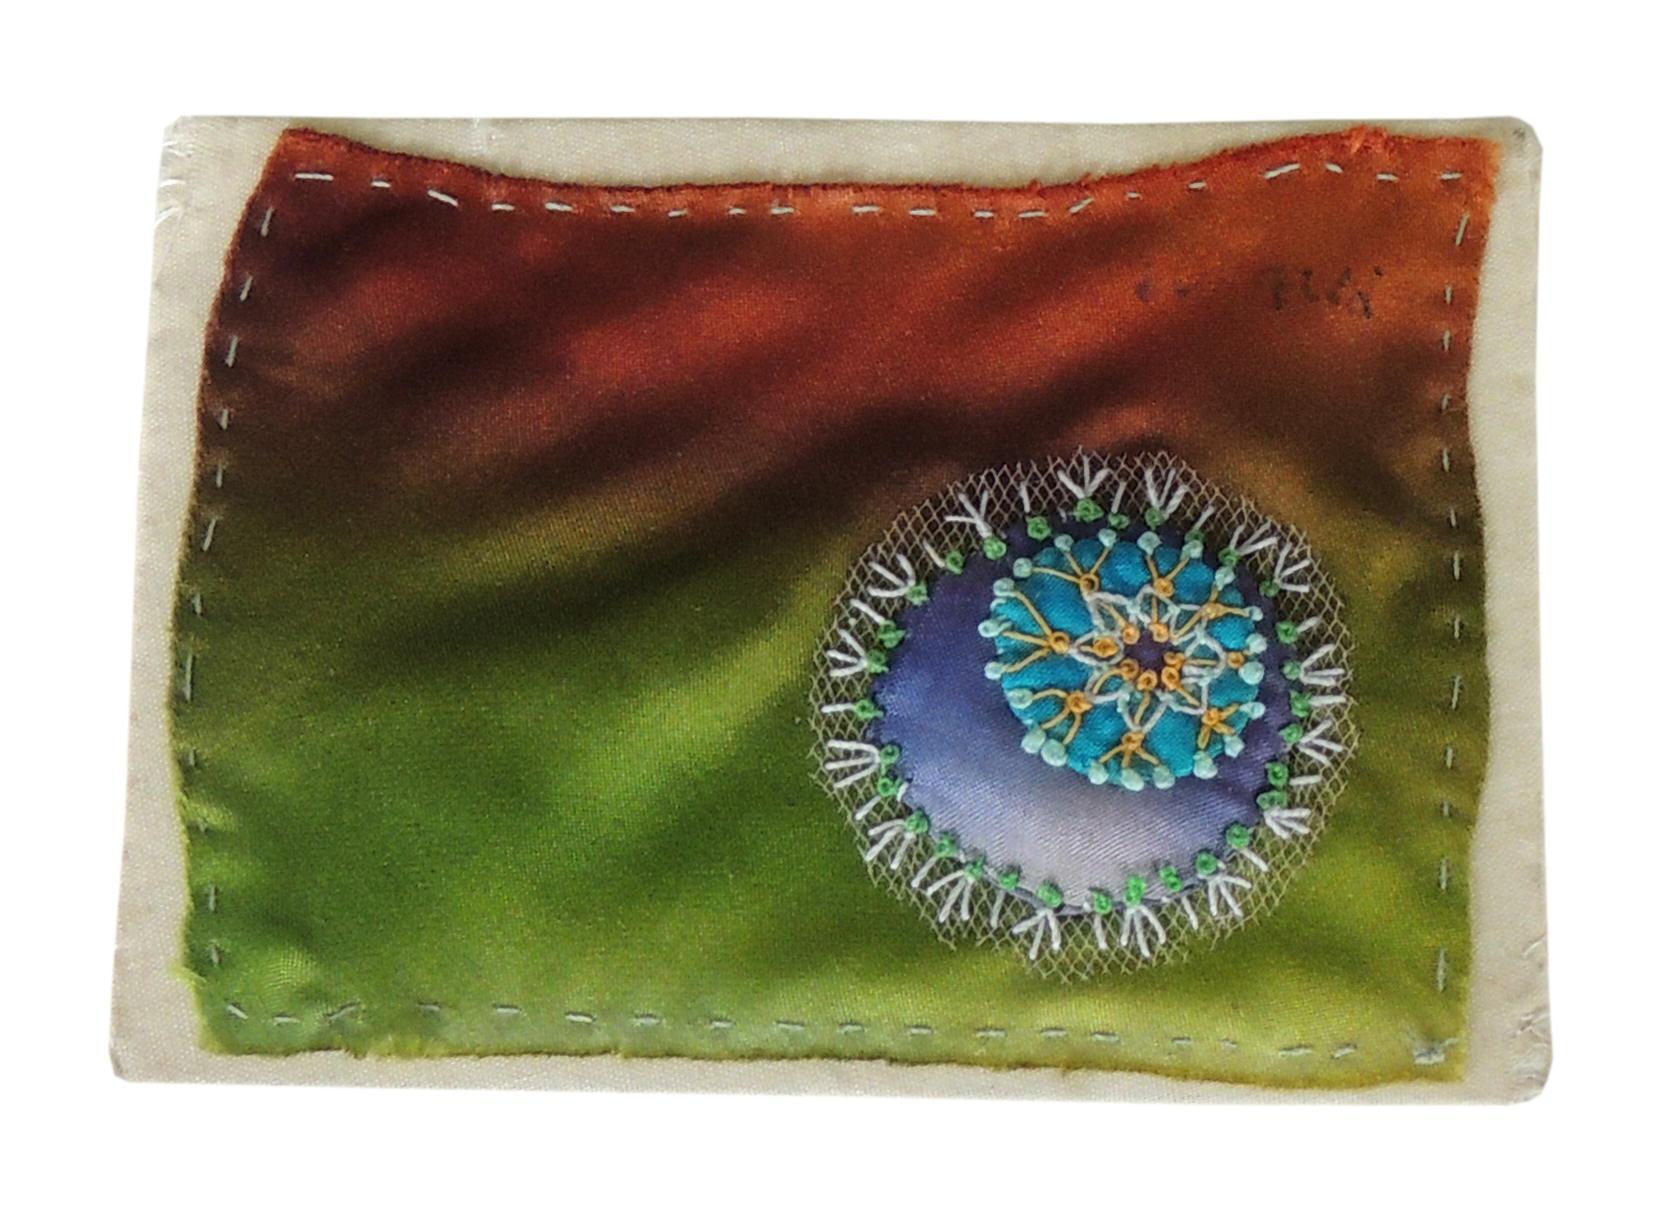 "Marianne Rabb Britton | MOLECULE ABSTRACT | Fabric & Embroidery | 3 x 4"" | Estate of Marianne Rabb Britton"